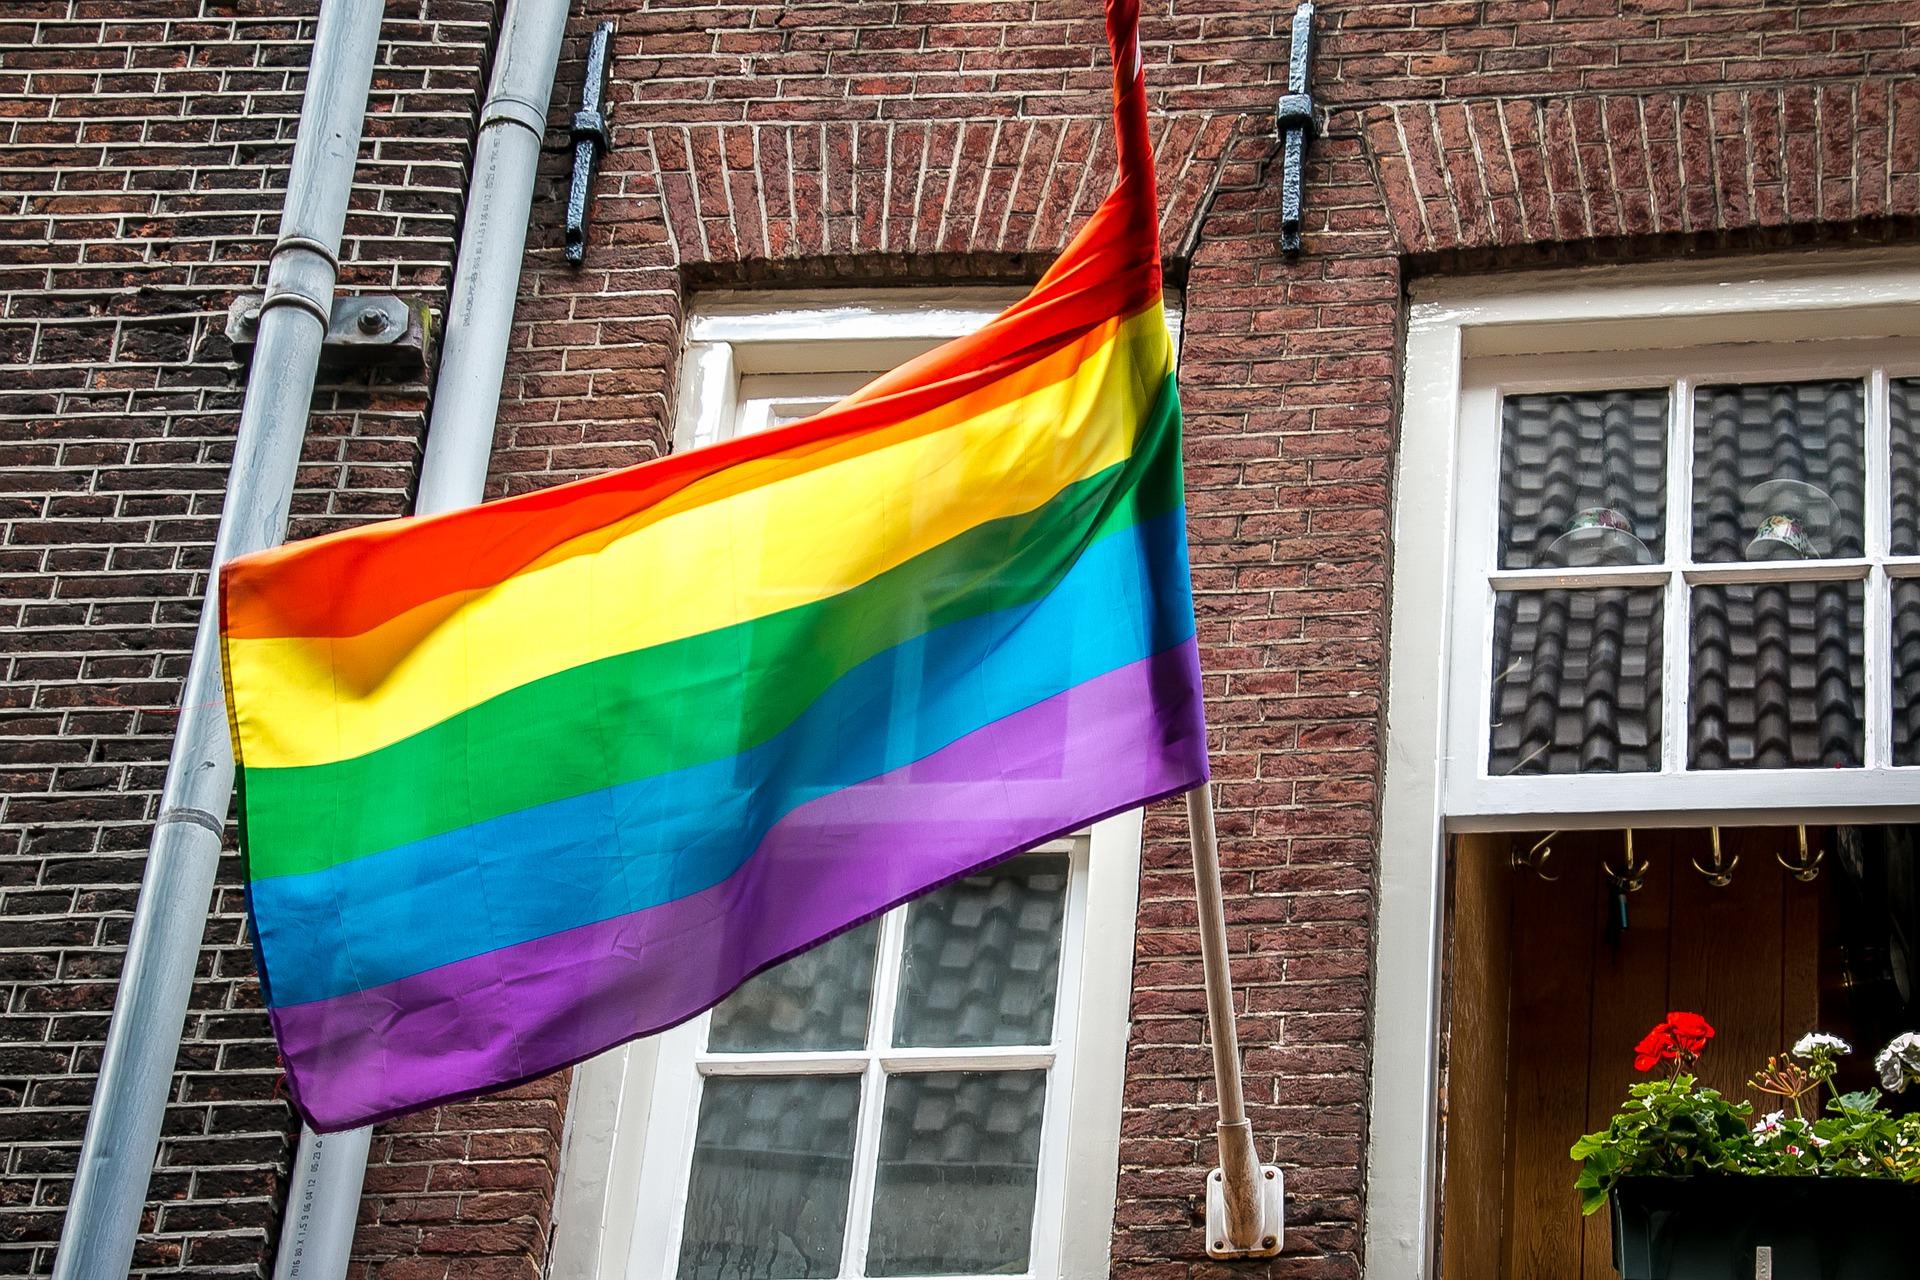 17. Mai: Internationaler Aktionstag gegen Homophobie und Transphobie